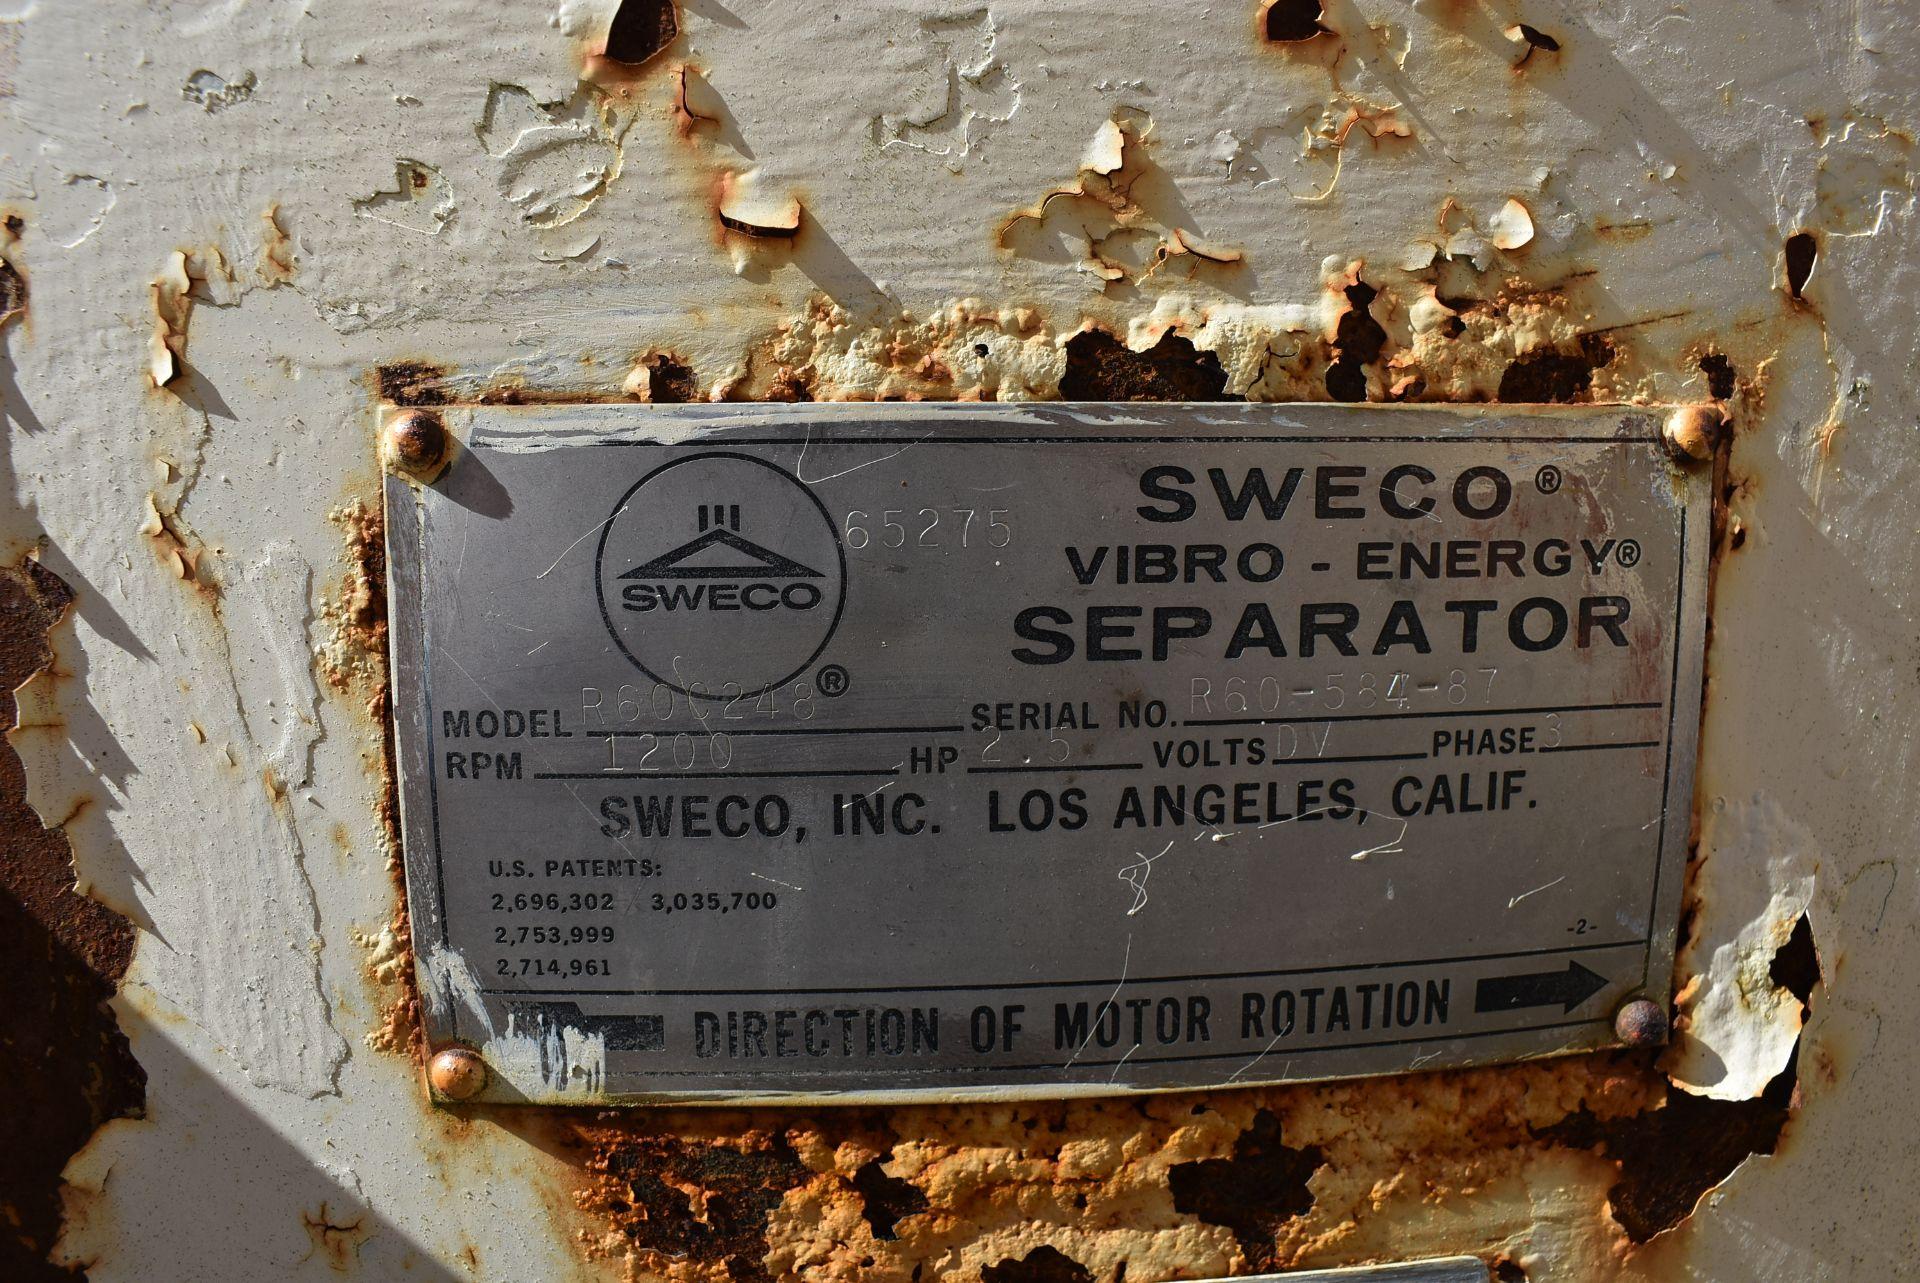 SWECO Model #R60C248 Vibratory Separator - Image 2 of 3